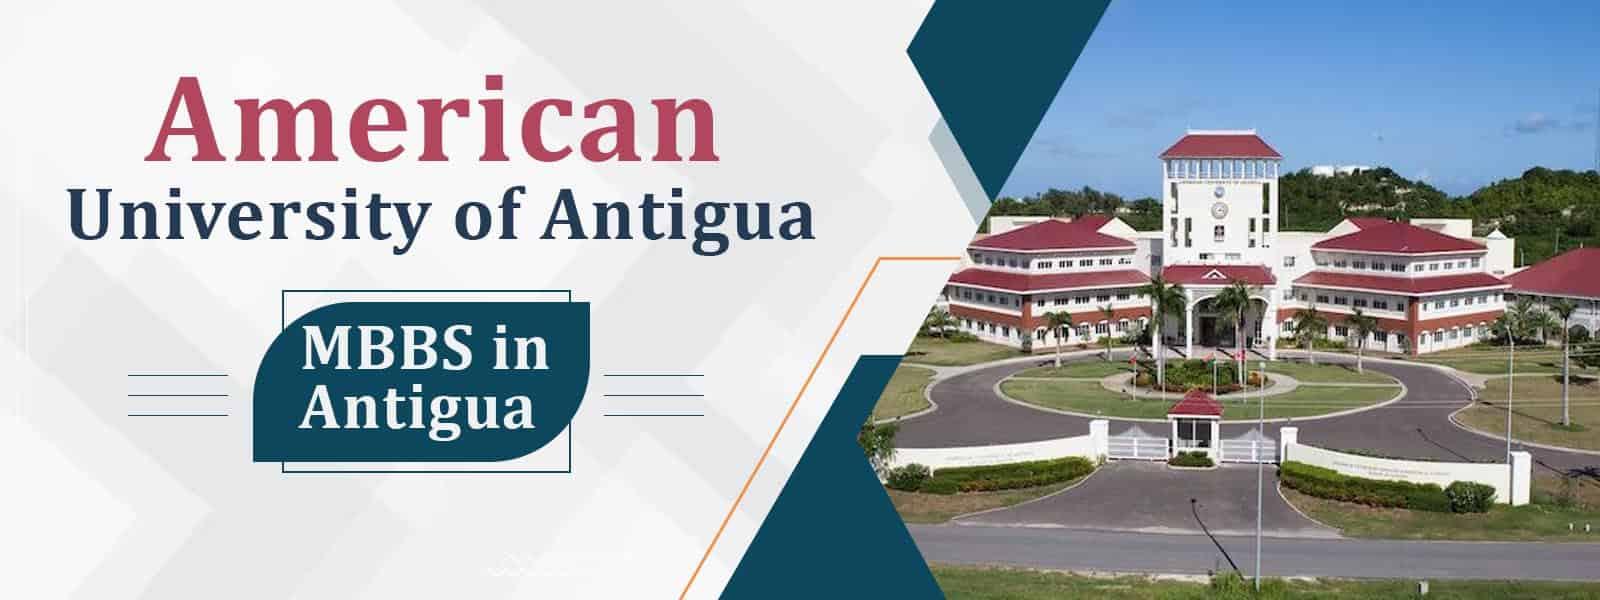 American University of Antigua MBBS Fees 2021